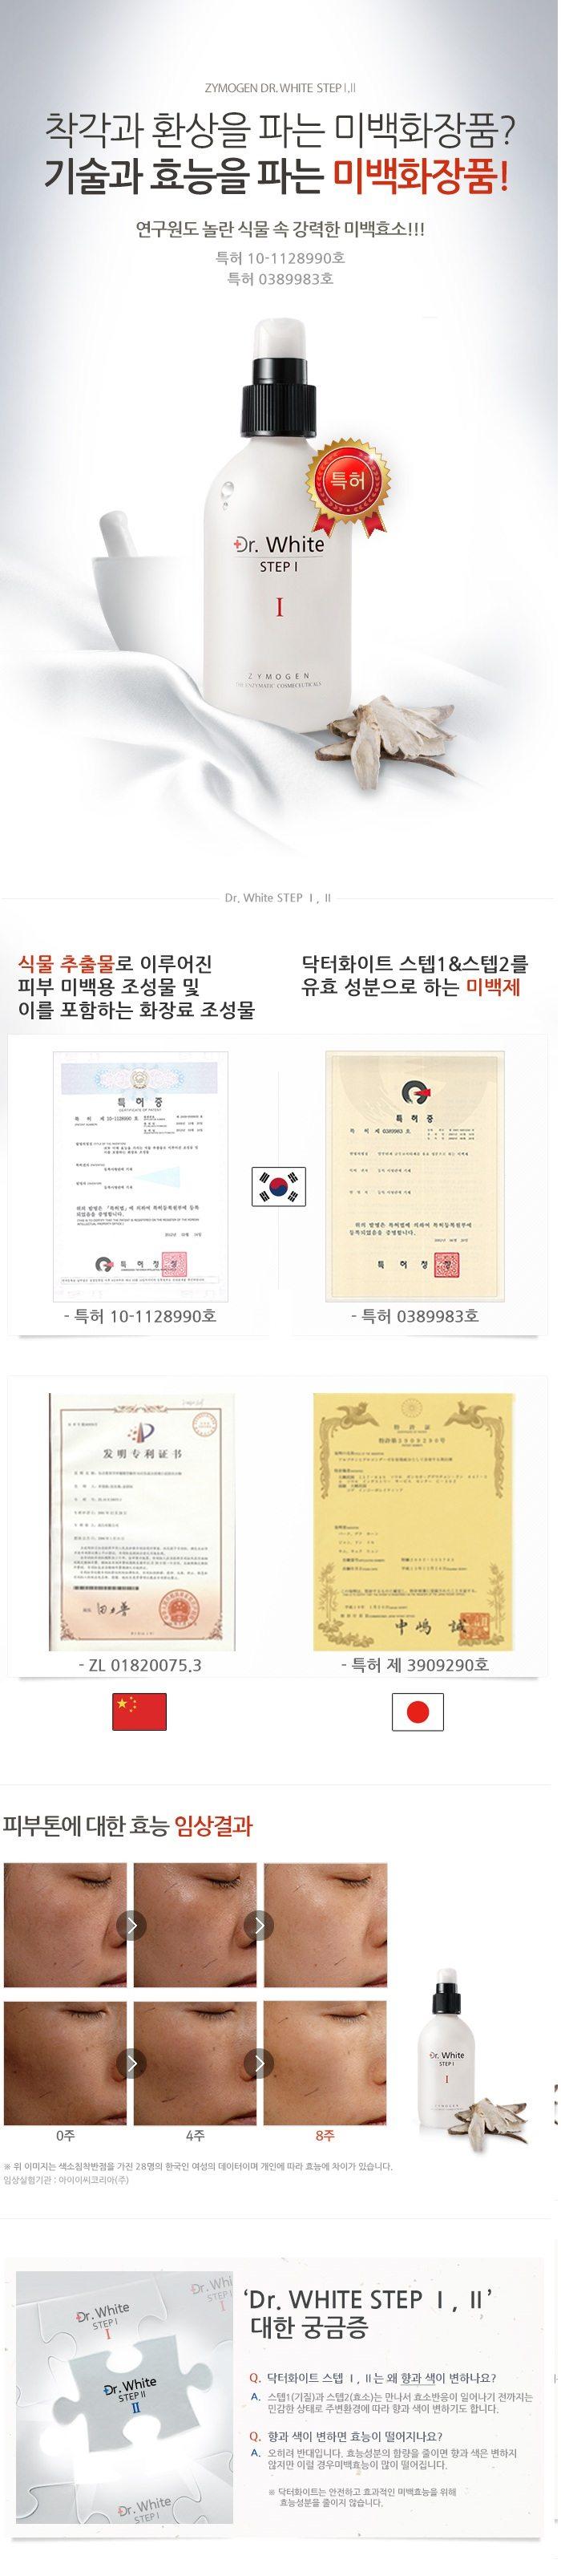 Zymogen Dr. White Step 1 korean cosmetic skincar product online shop malaysia brazil macau1